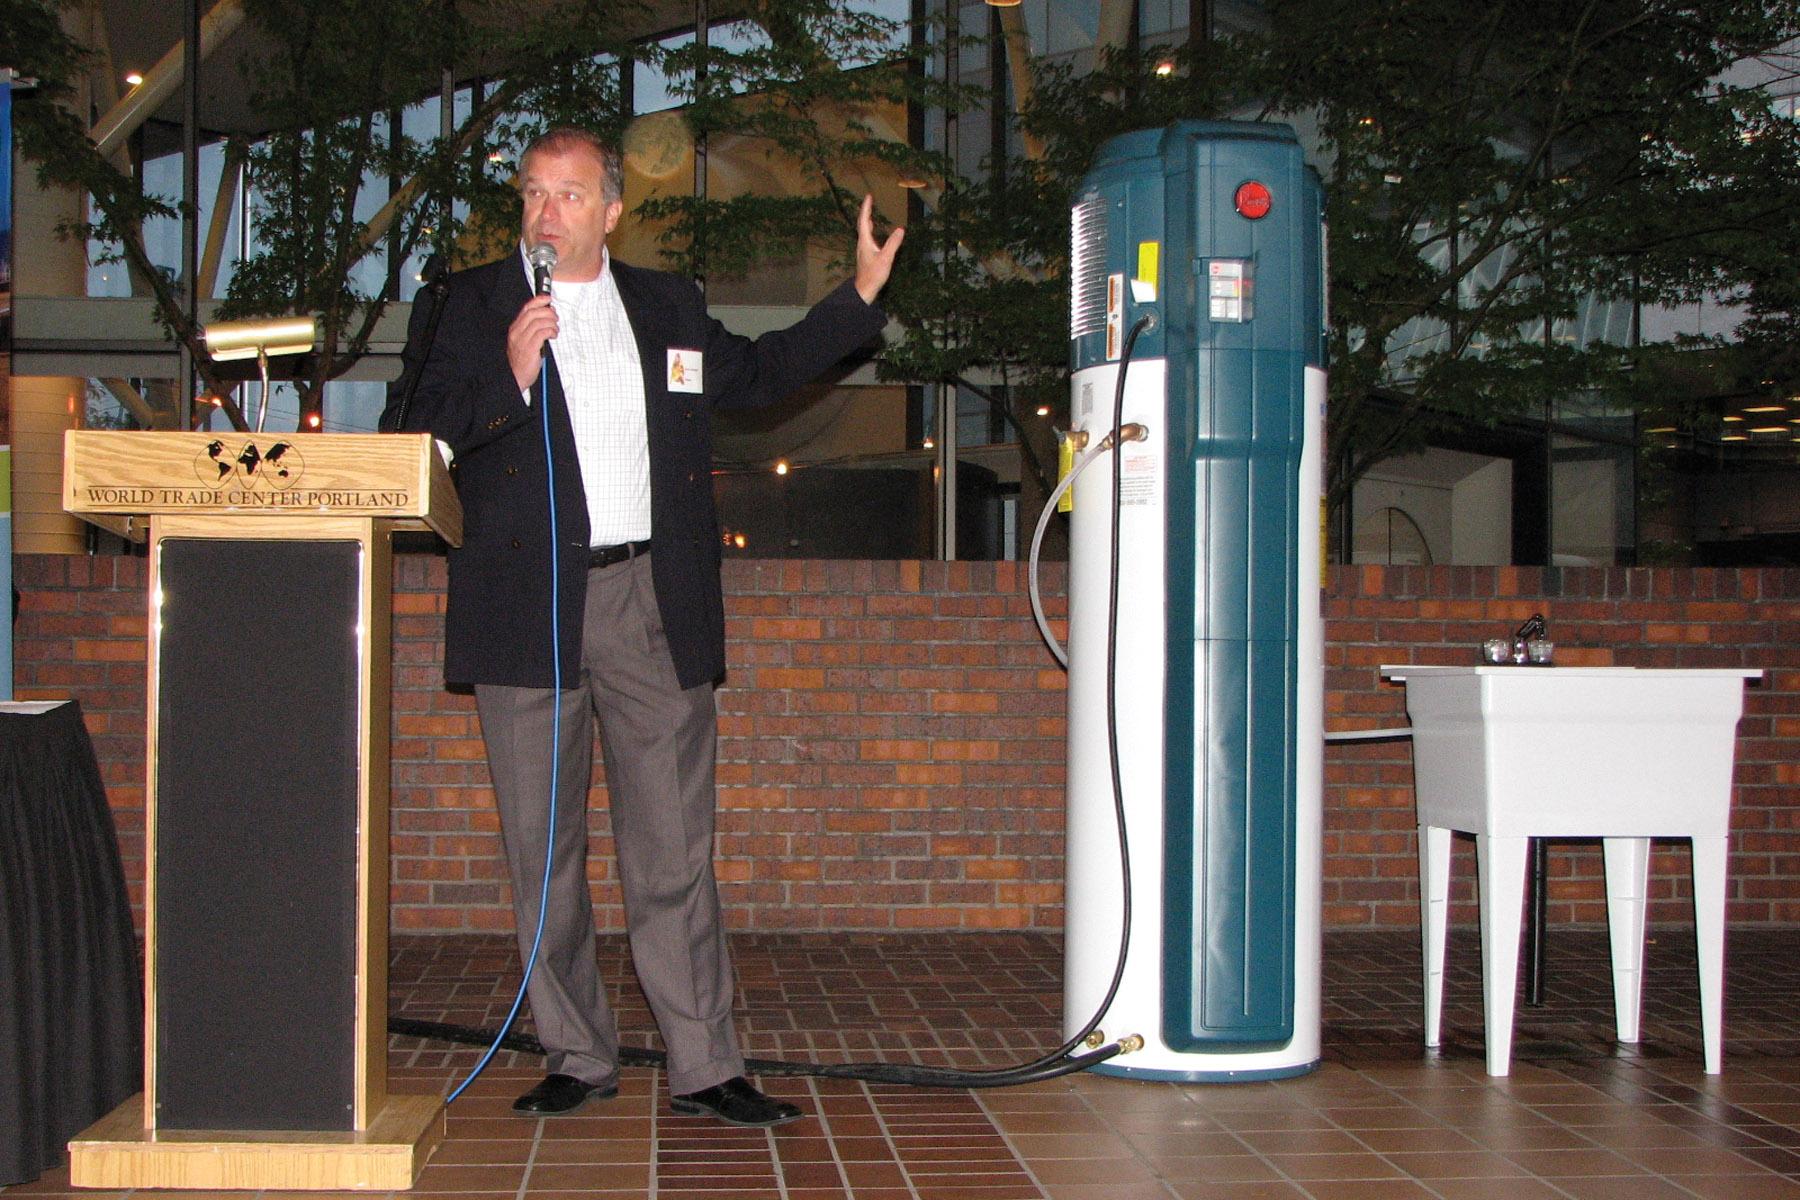 Rheem Heat Pump Water Heater